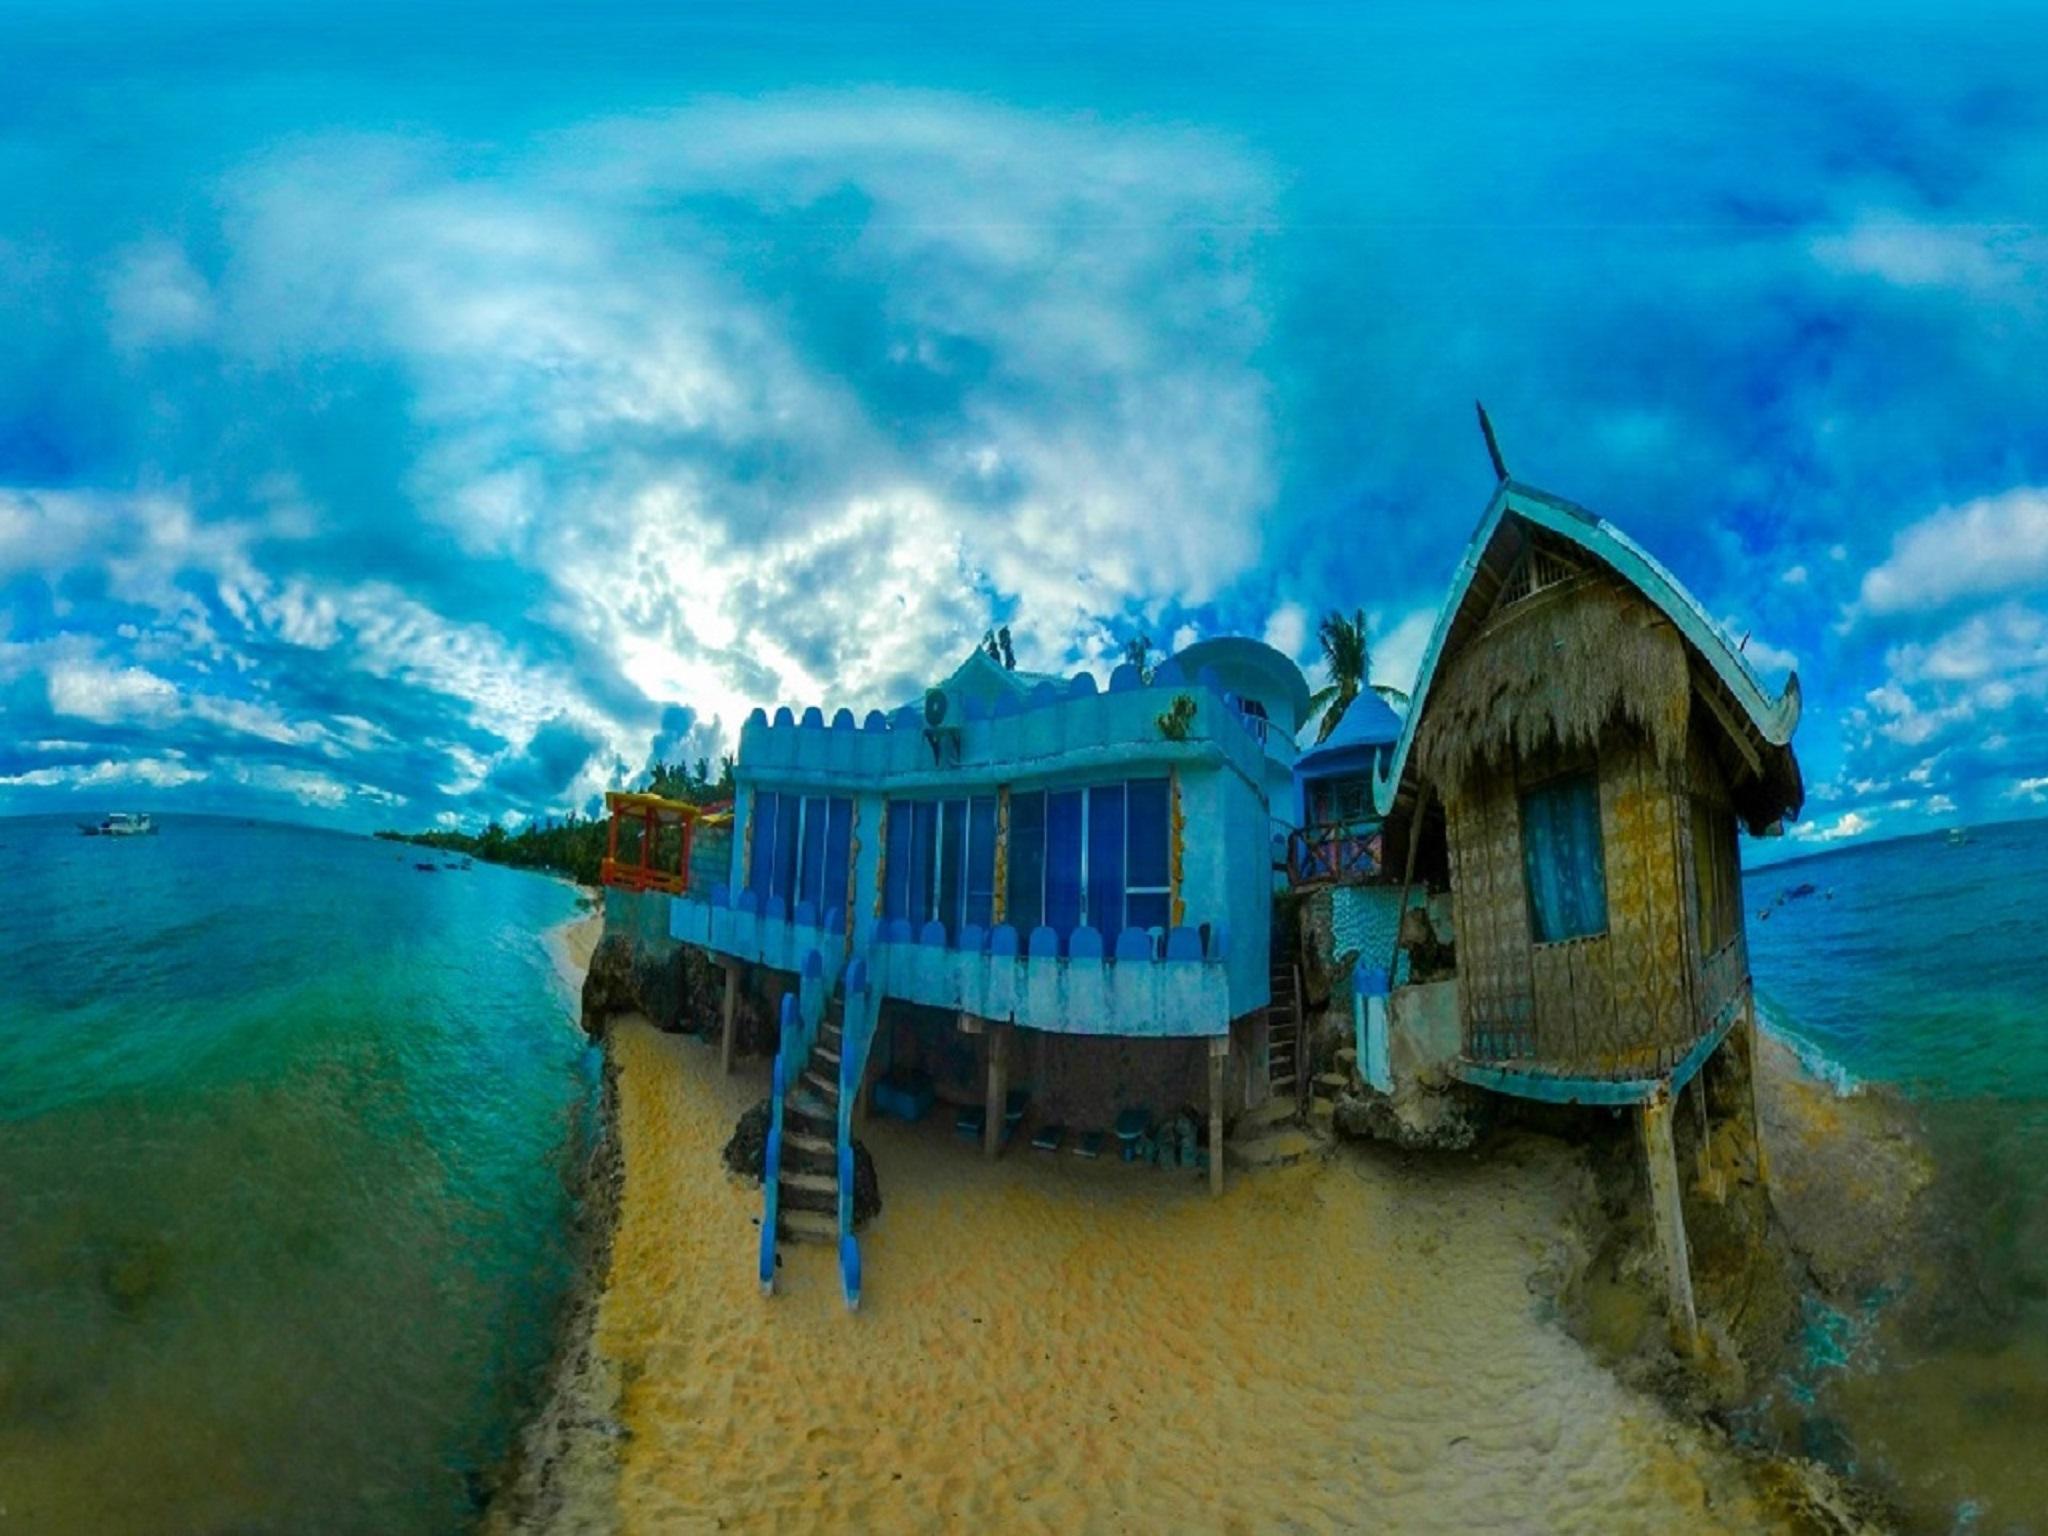 Hhle 2 im El Paradiso Resort Alcoy